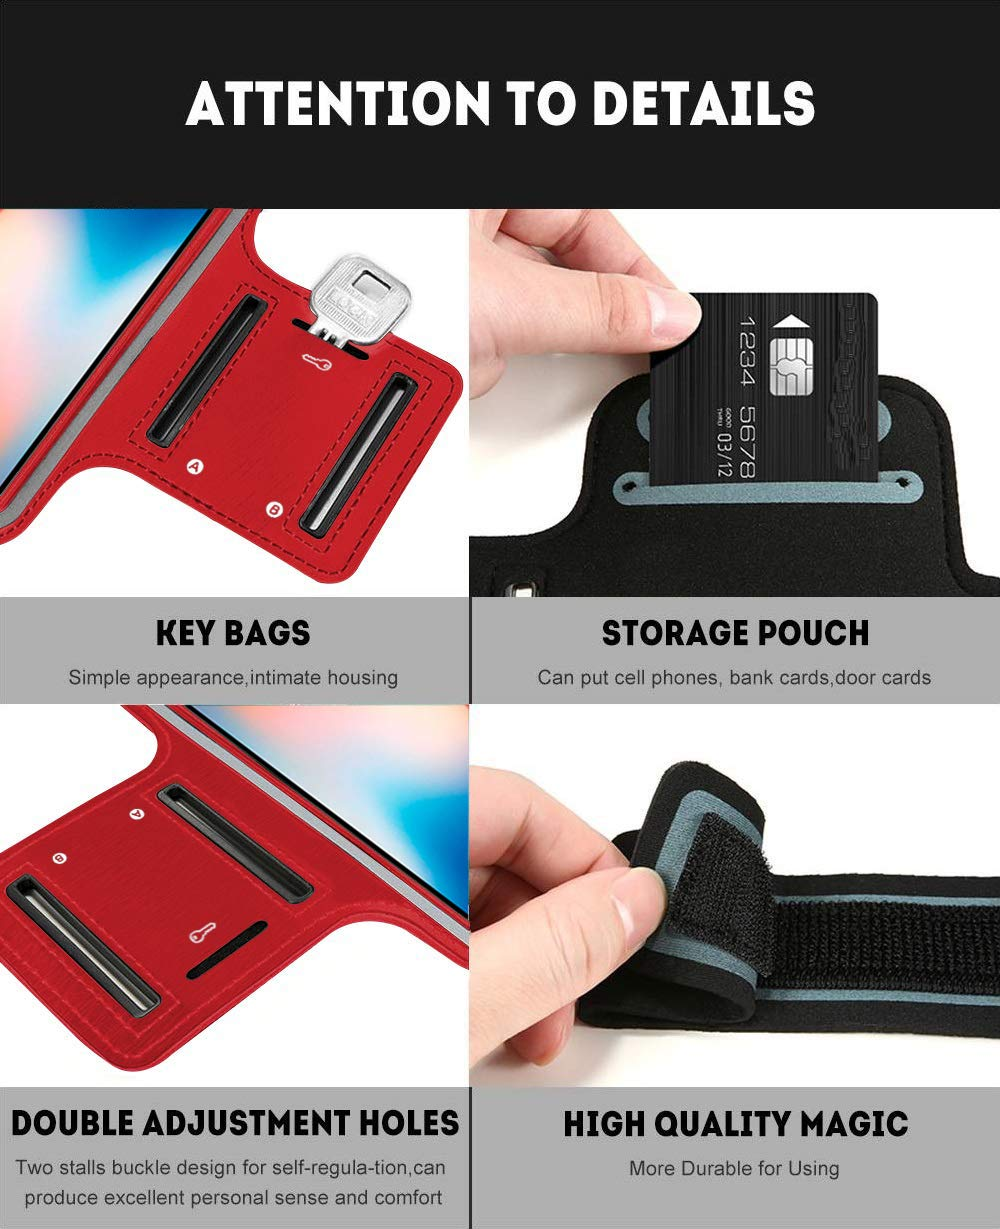 Violeta Brazalete Deportivo Compatible con Xiaomi Redmi Note 8 Pro Running Neopreno Ajustable Velcro antisudor Antideslizante Bolsillo para Auriculares Llaves